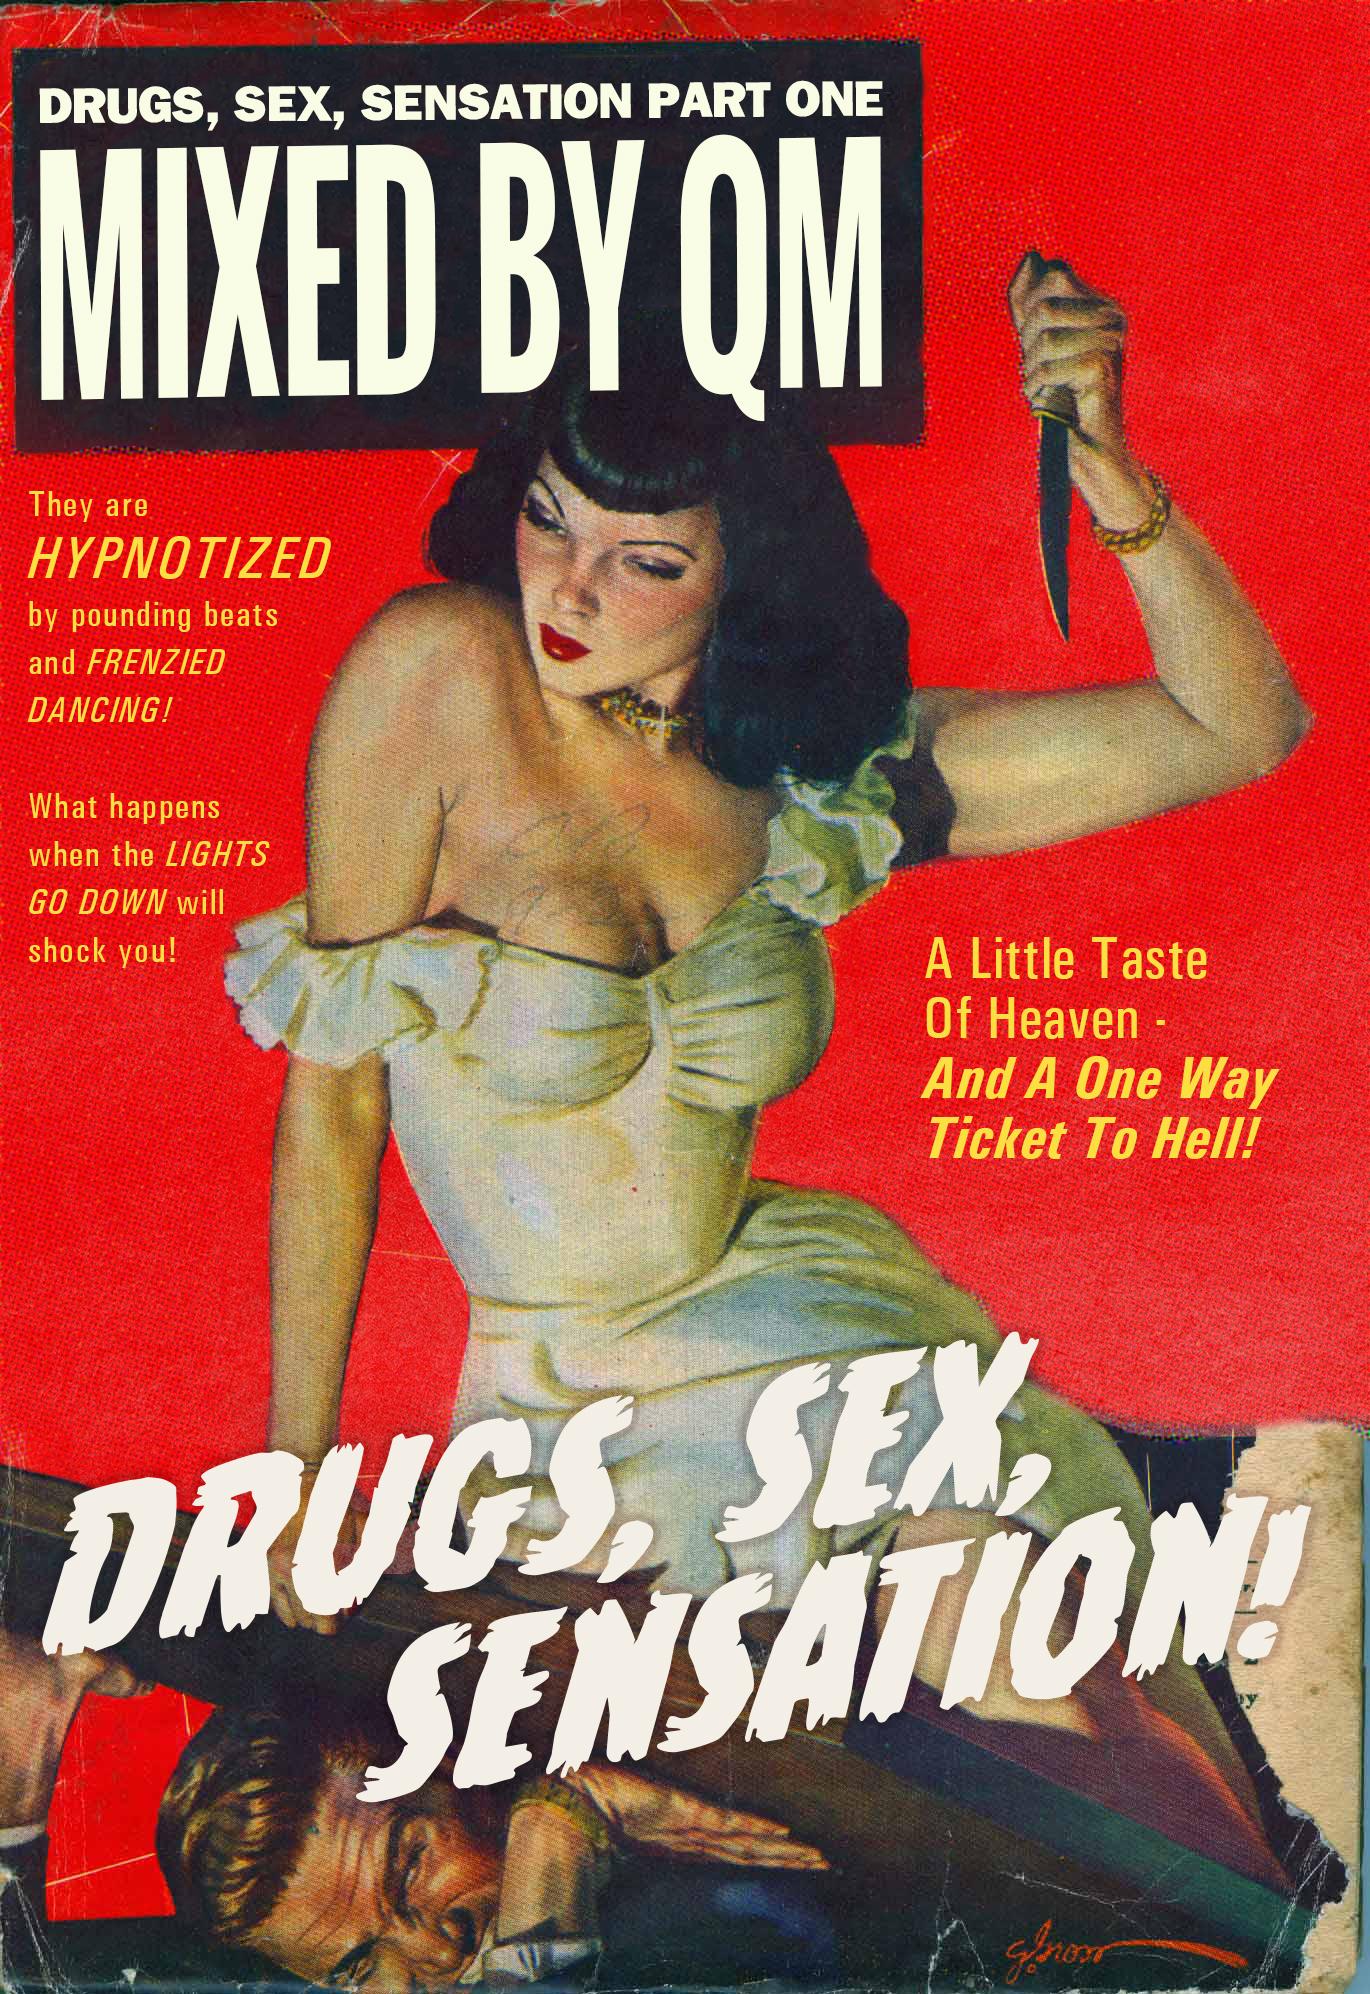 sex drugs sensation x QM.jpg